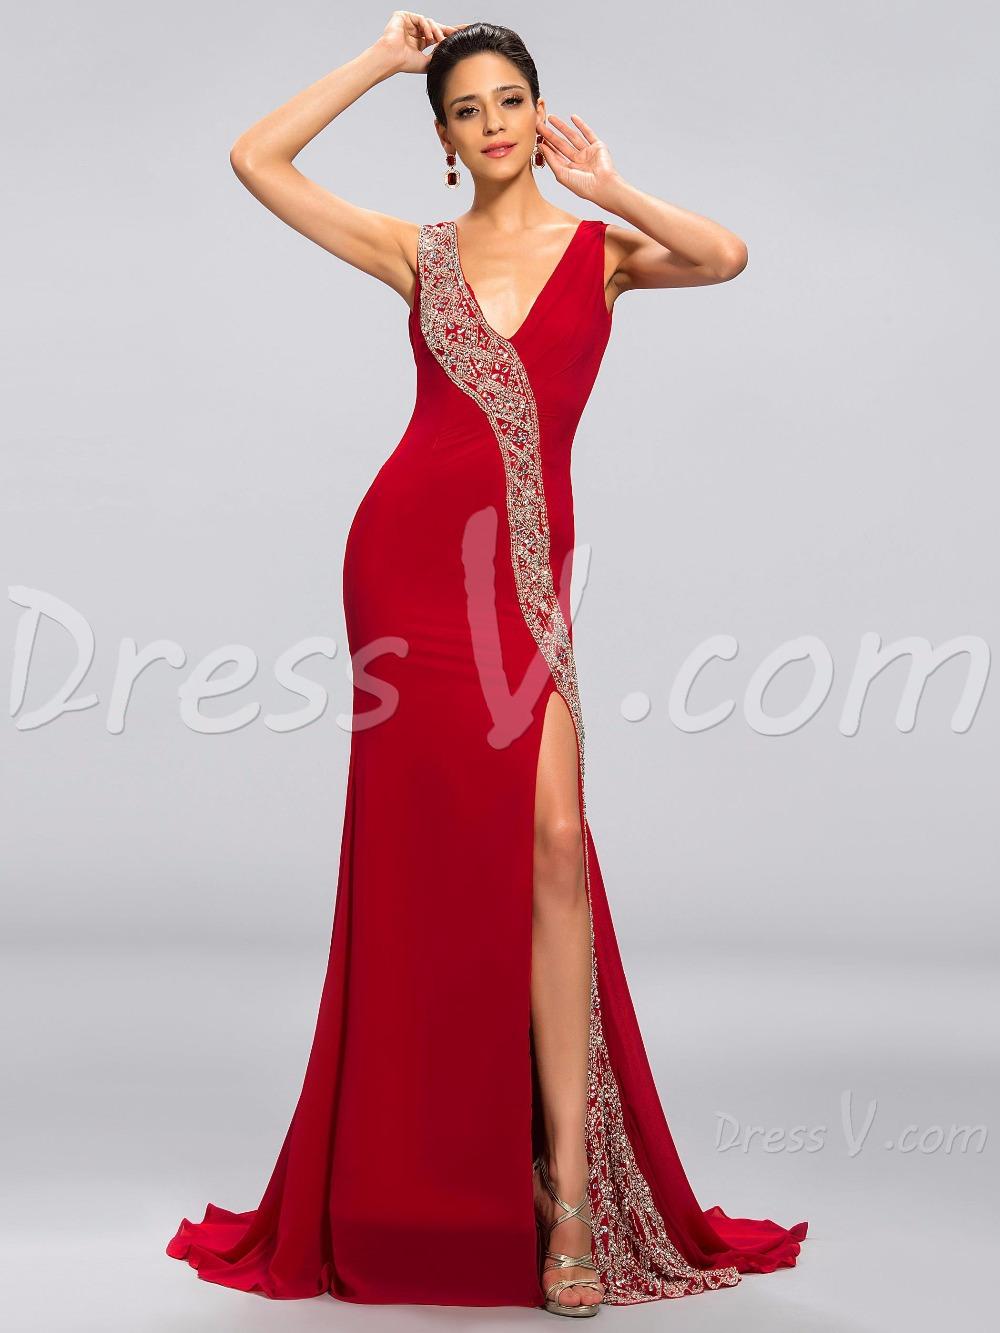 Pink Prom Dresses 2013 Robes étonnantes ...